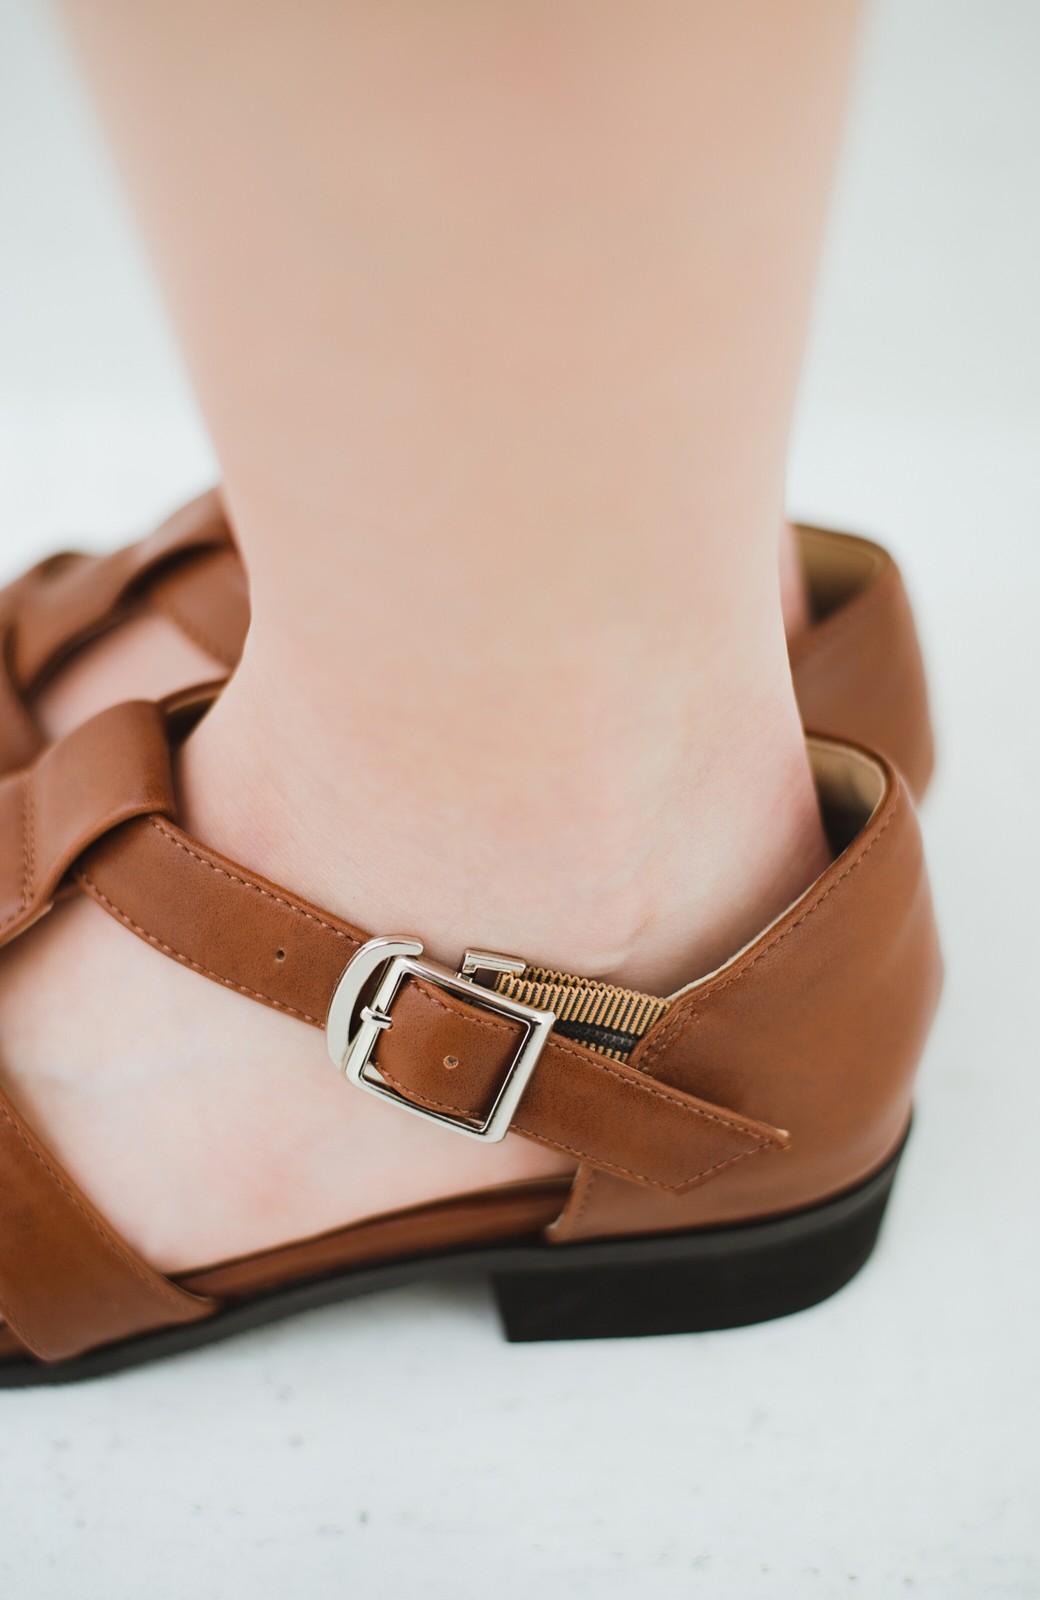 haco! 靴下でも素足でも合う 本革風編み込みサンダル <ブラウン>の商品写真6